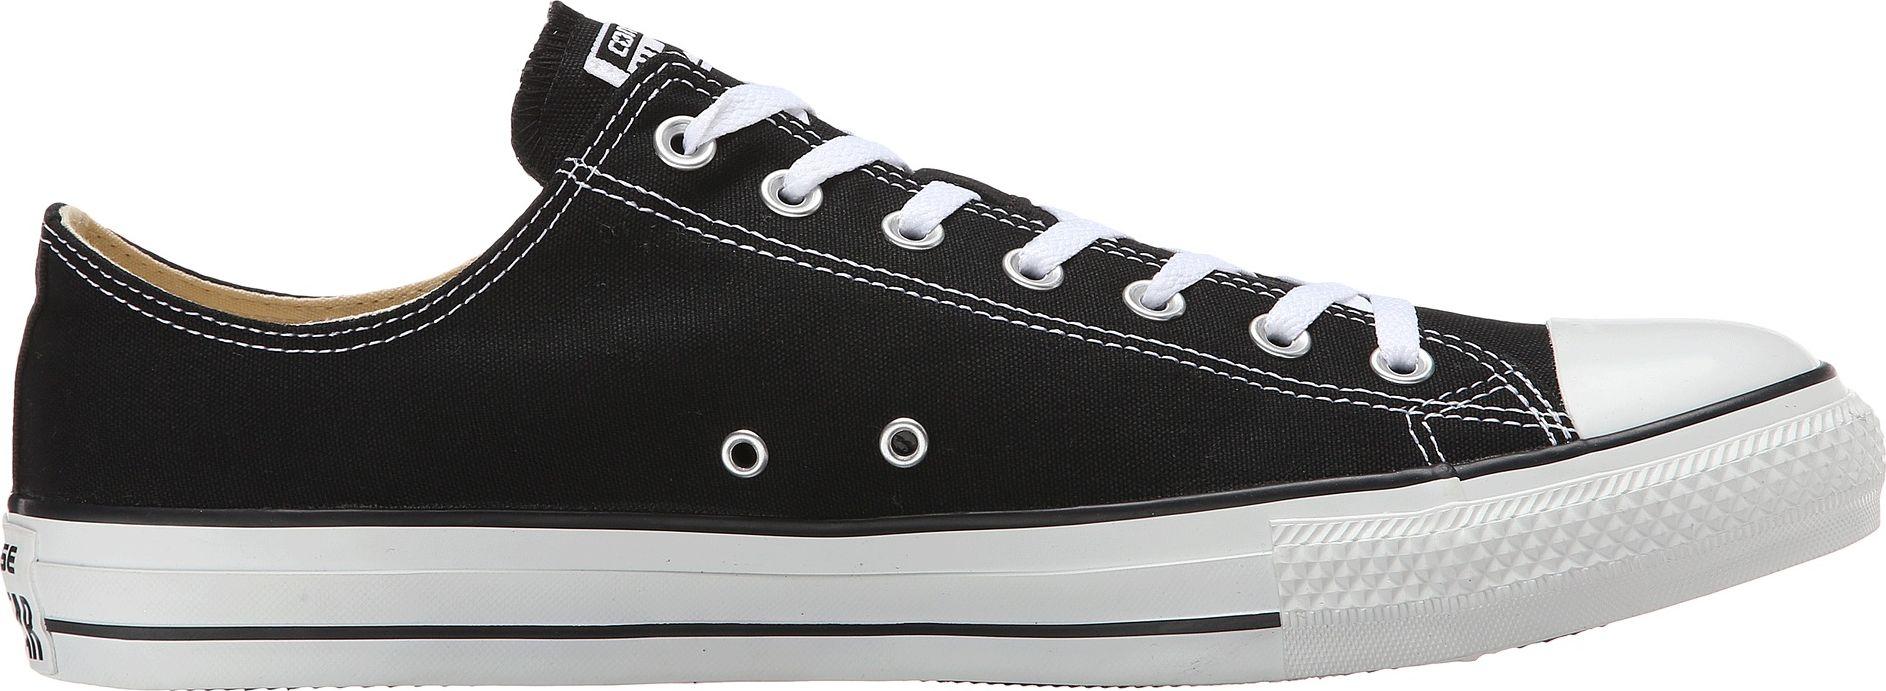 Converse Chuck Taylor All Star Ox Black/White 43